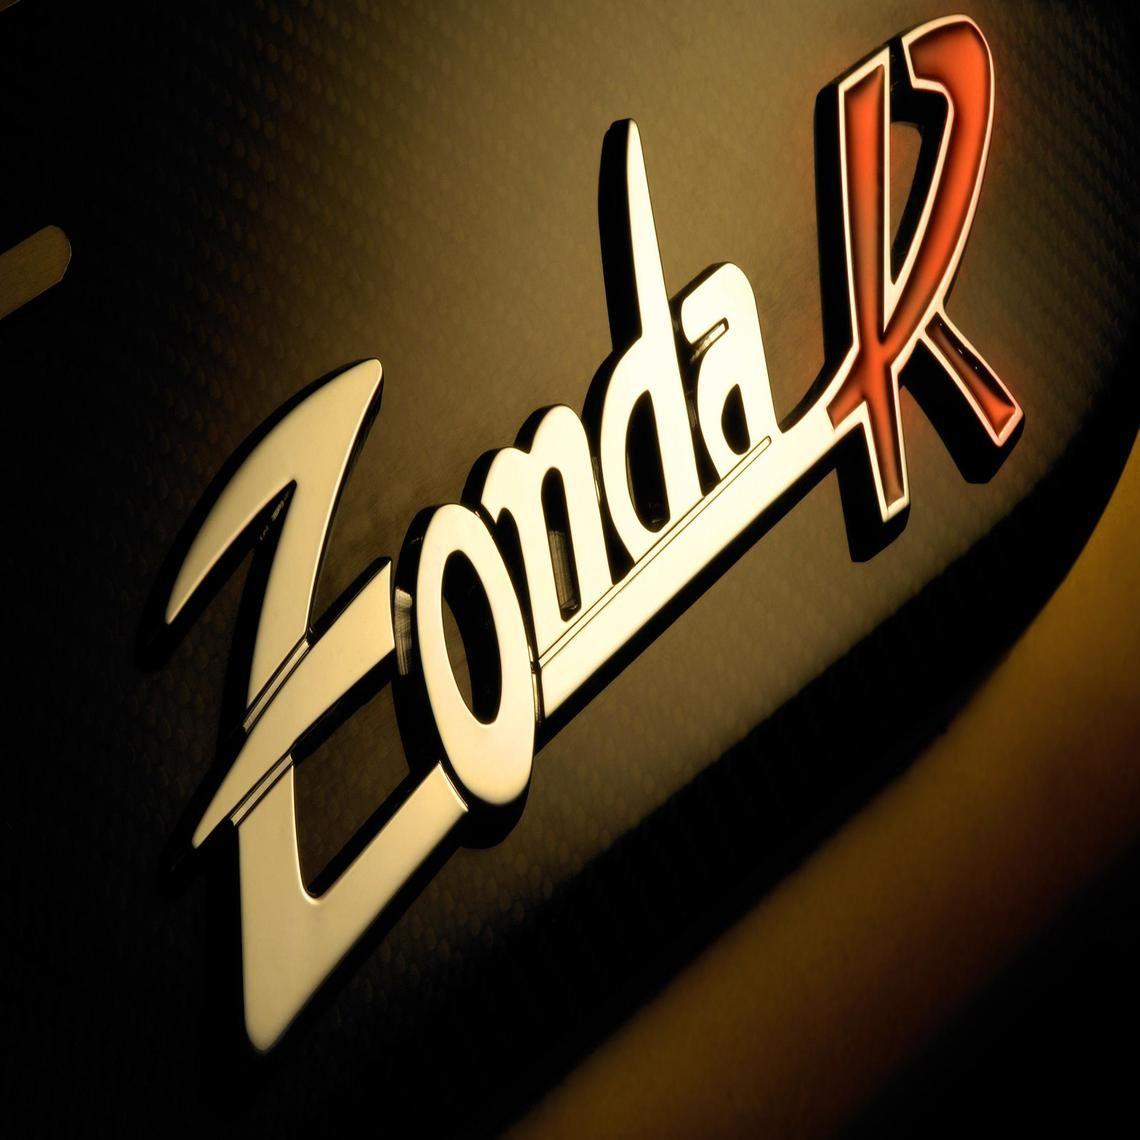 Pagani Zonda Logo Logo Wallpaper Hd Pagani Zonda Pagani Zonda R